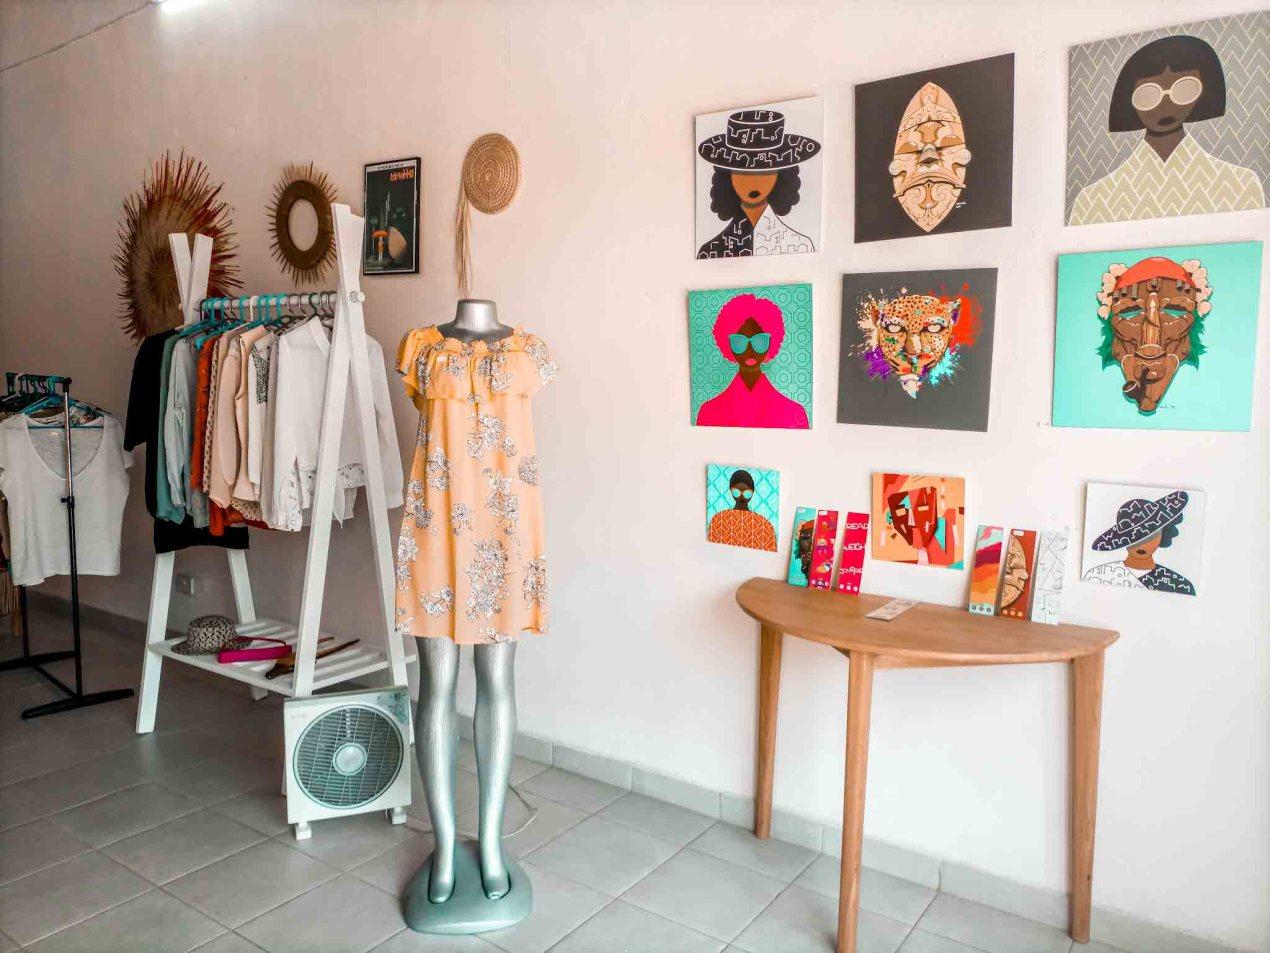 Kaso Thrift Store